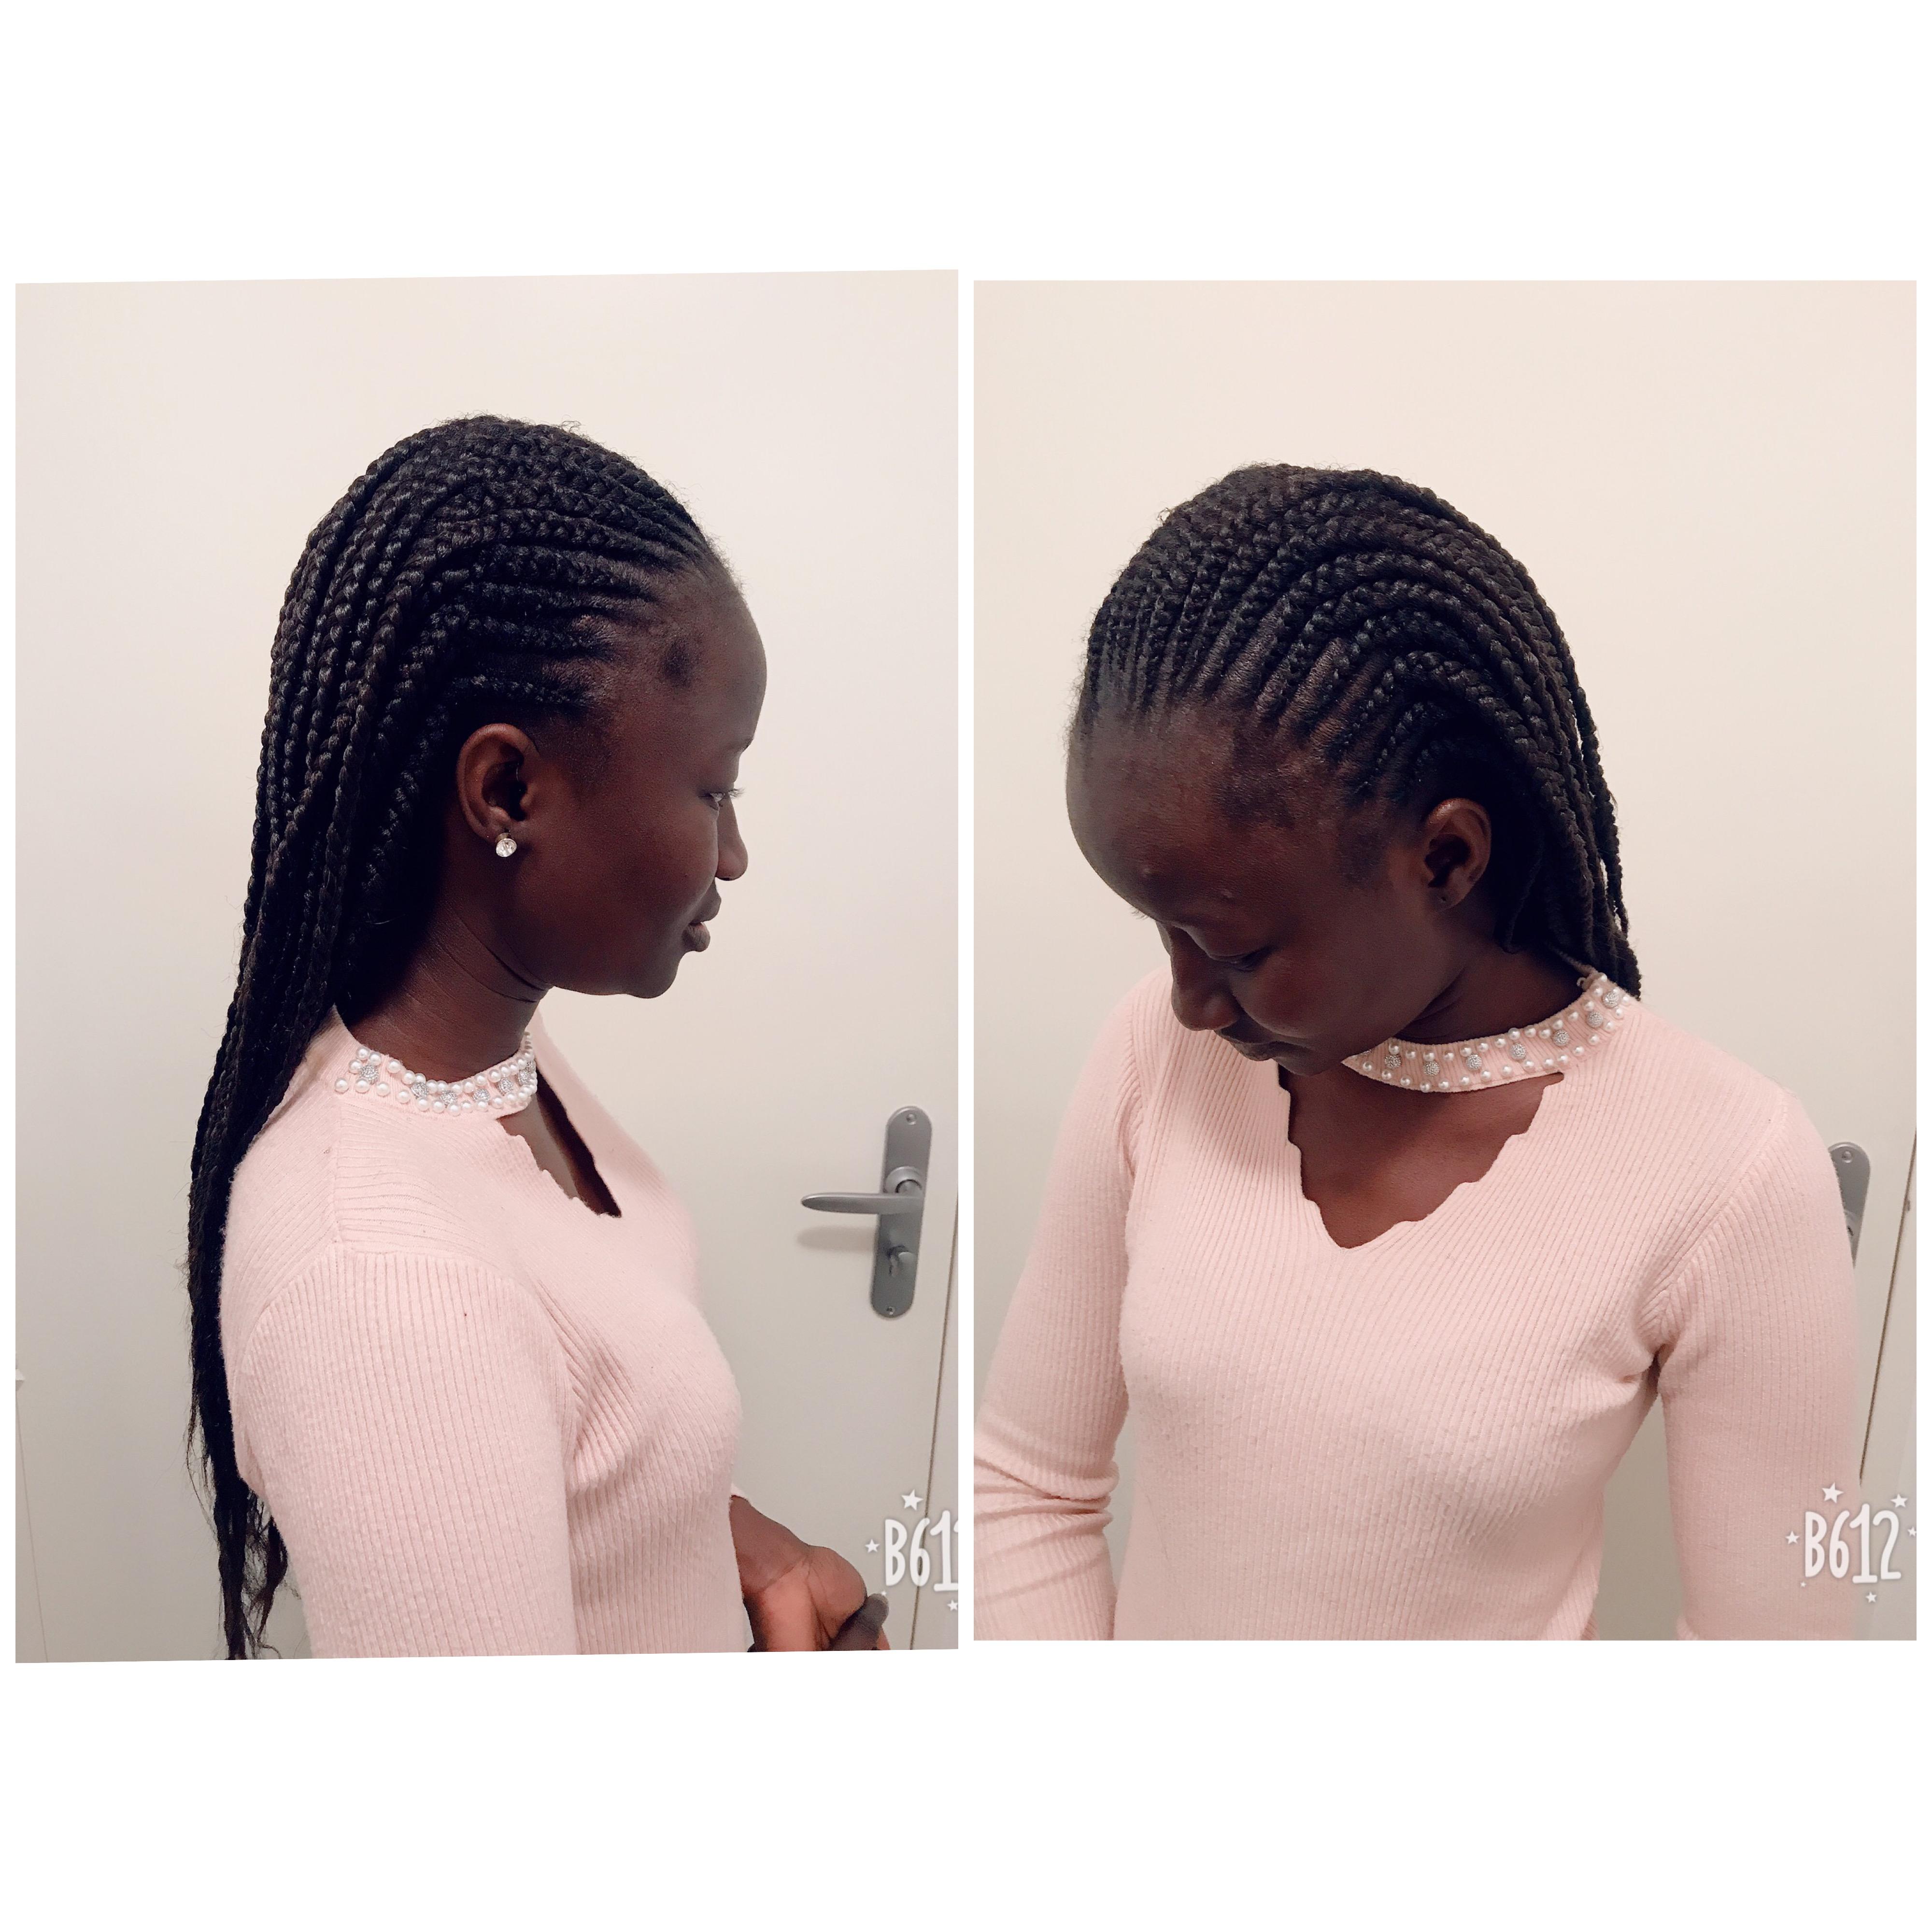 salon de coiffure afro tresse tresses box braids crochet braids vanilles tissages paris 75 77 78 91 92 93 94 95 IIIODJAR